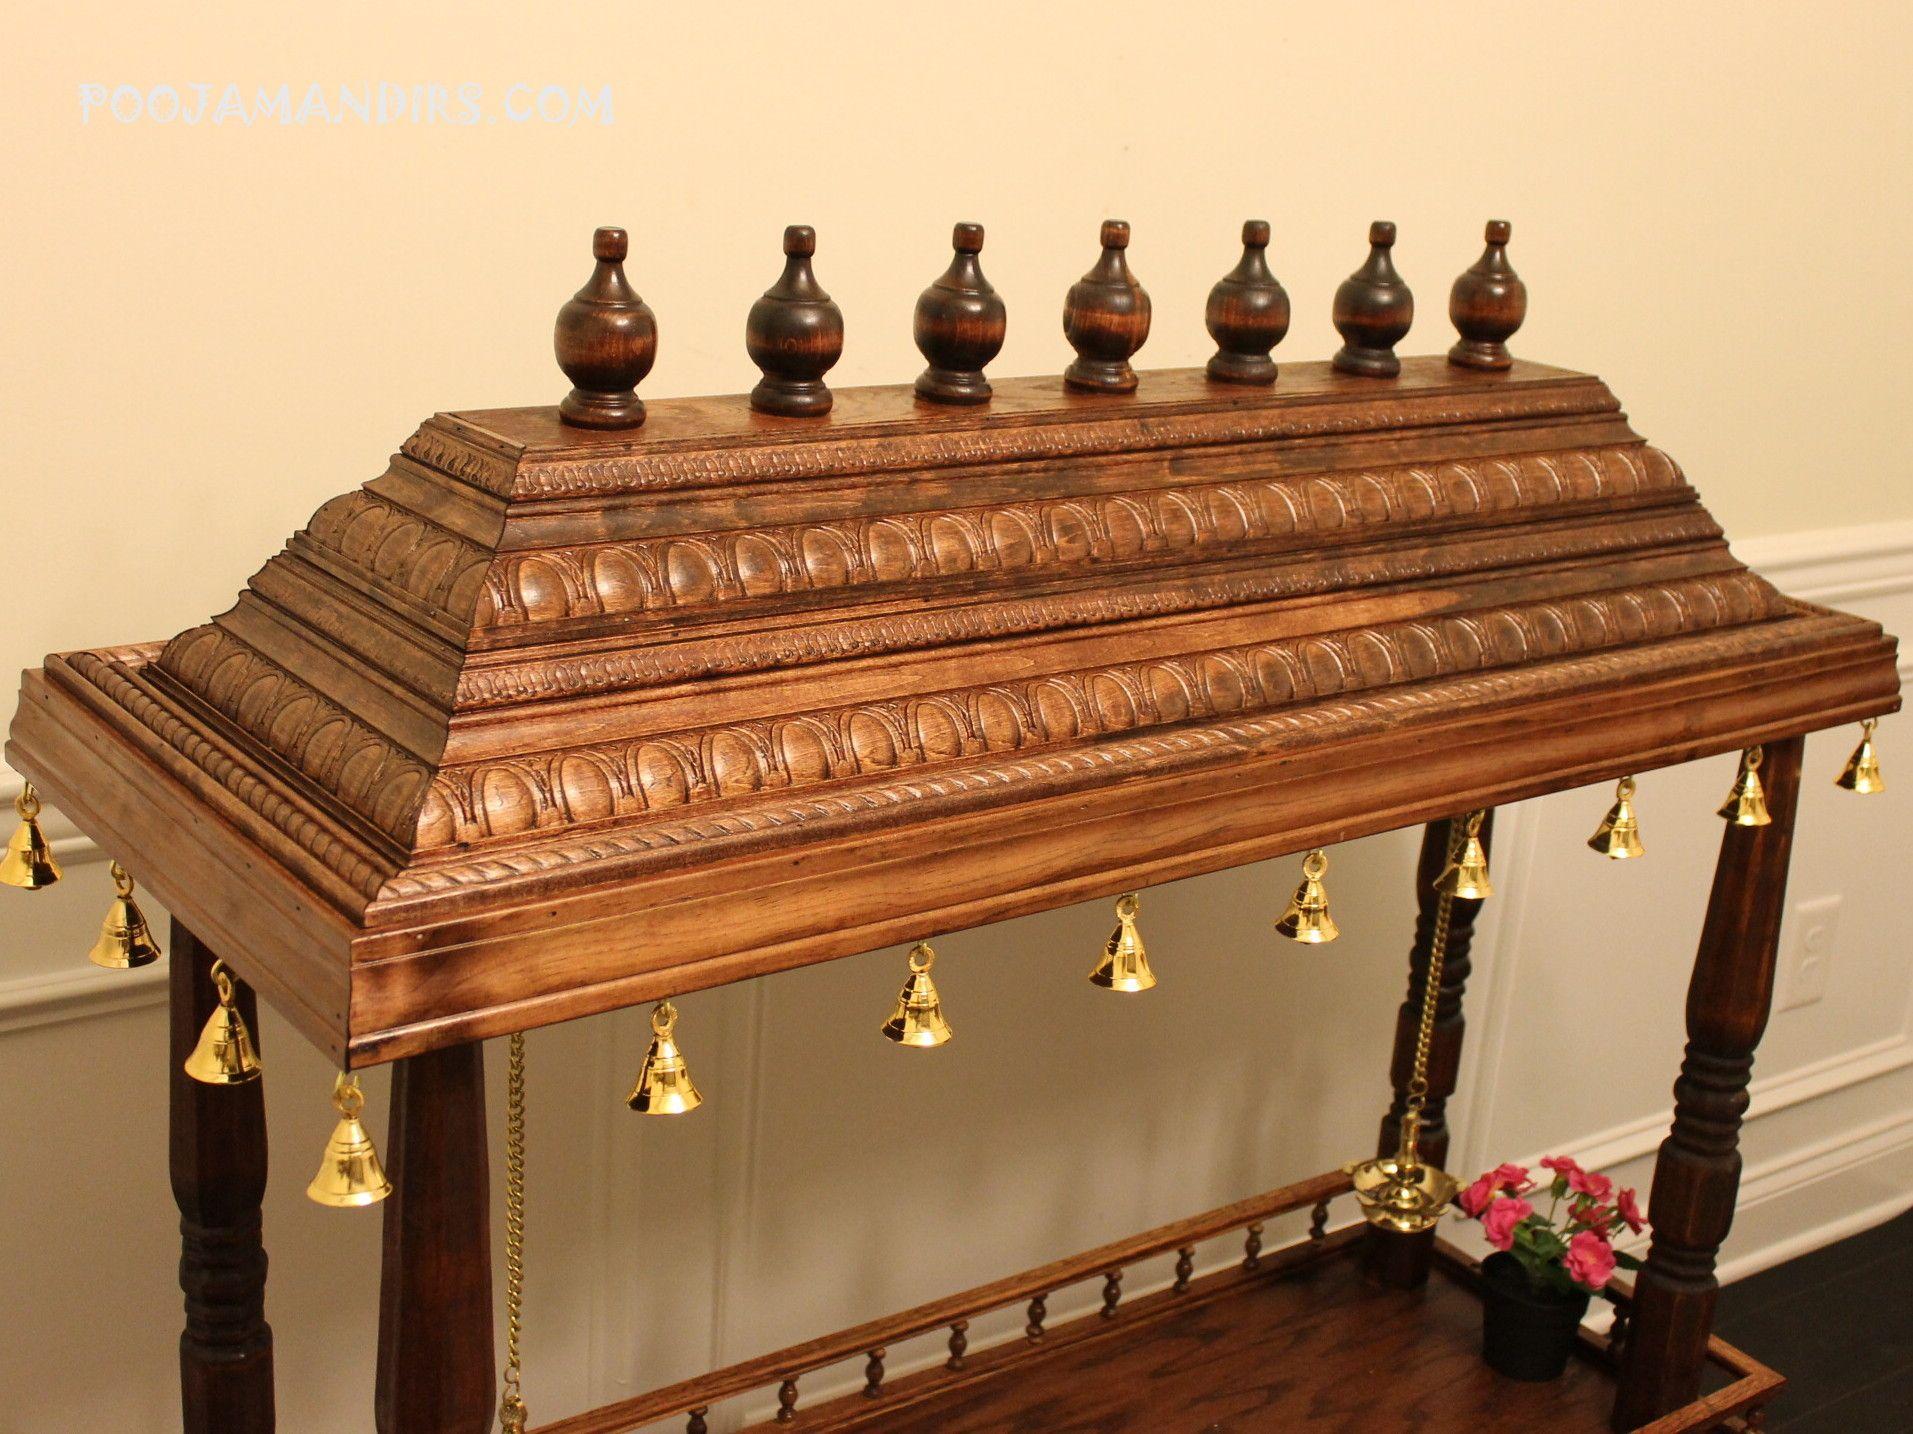 dbb802a54 Pooja Mandirs USA - Ashwini Collection - Open Model | Pooja Mandir ...